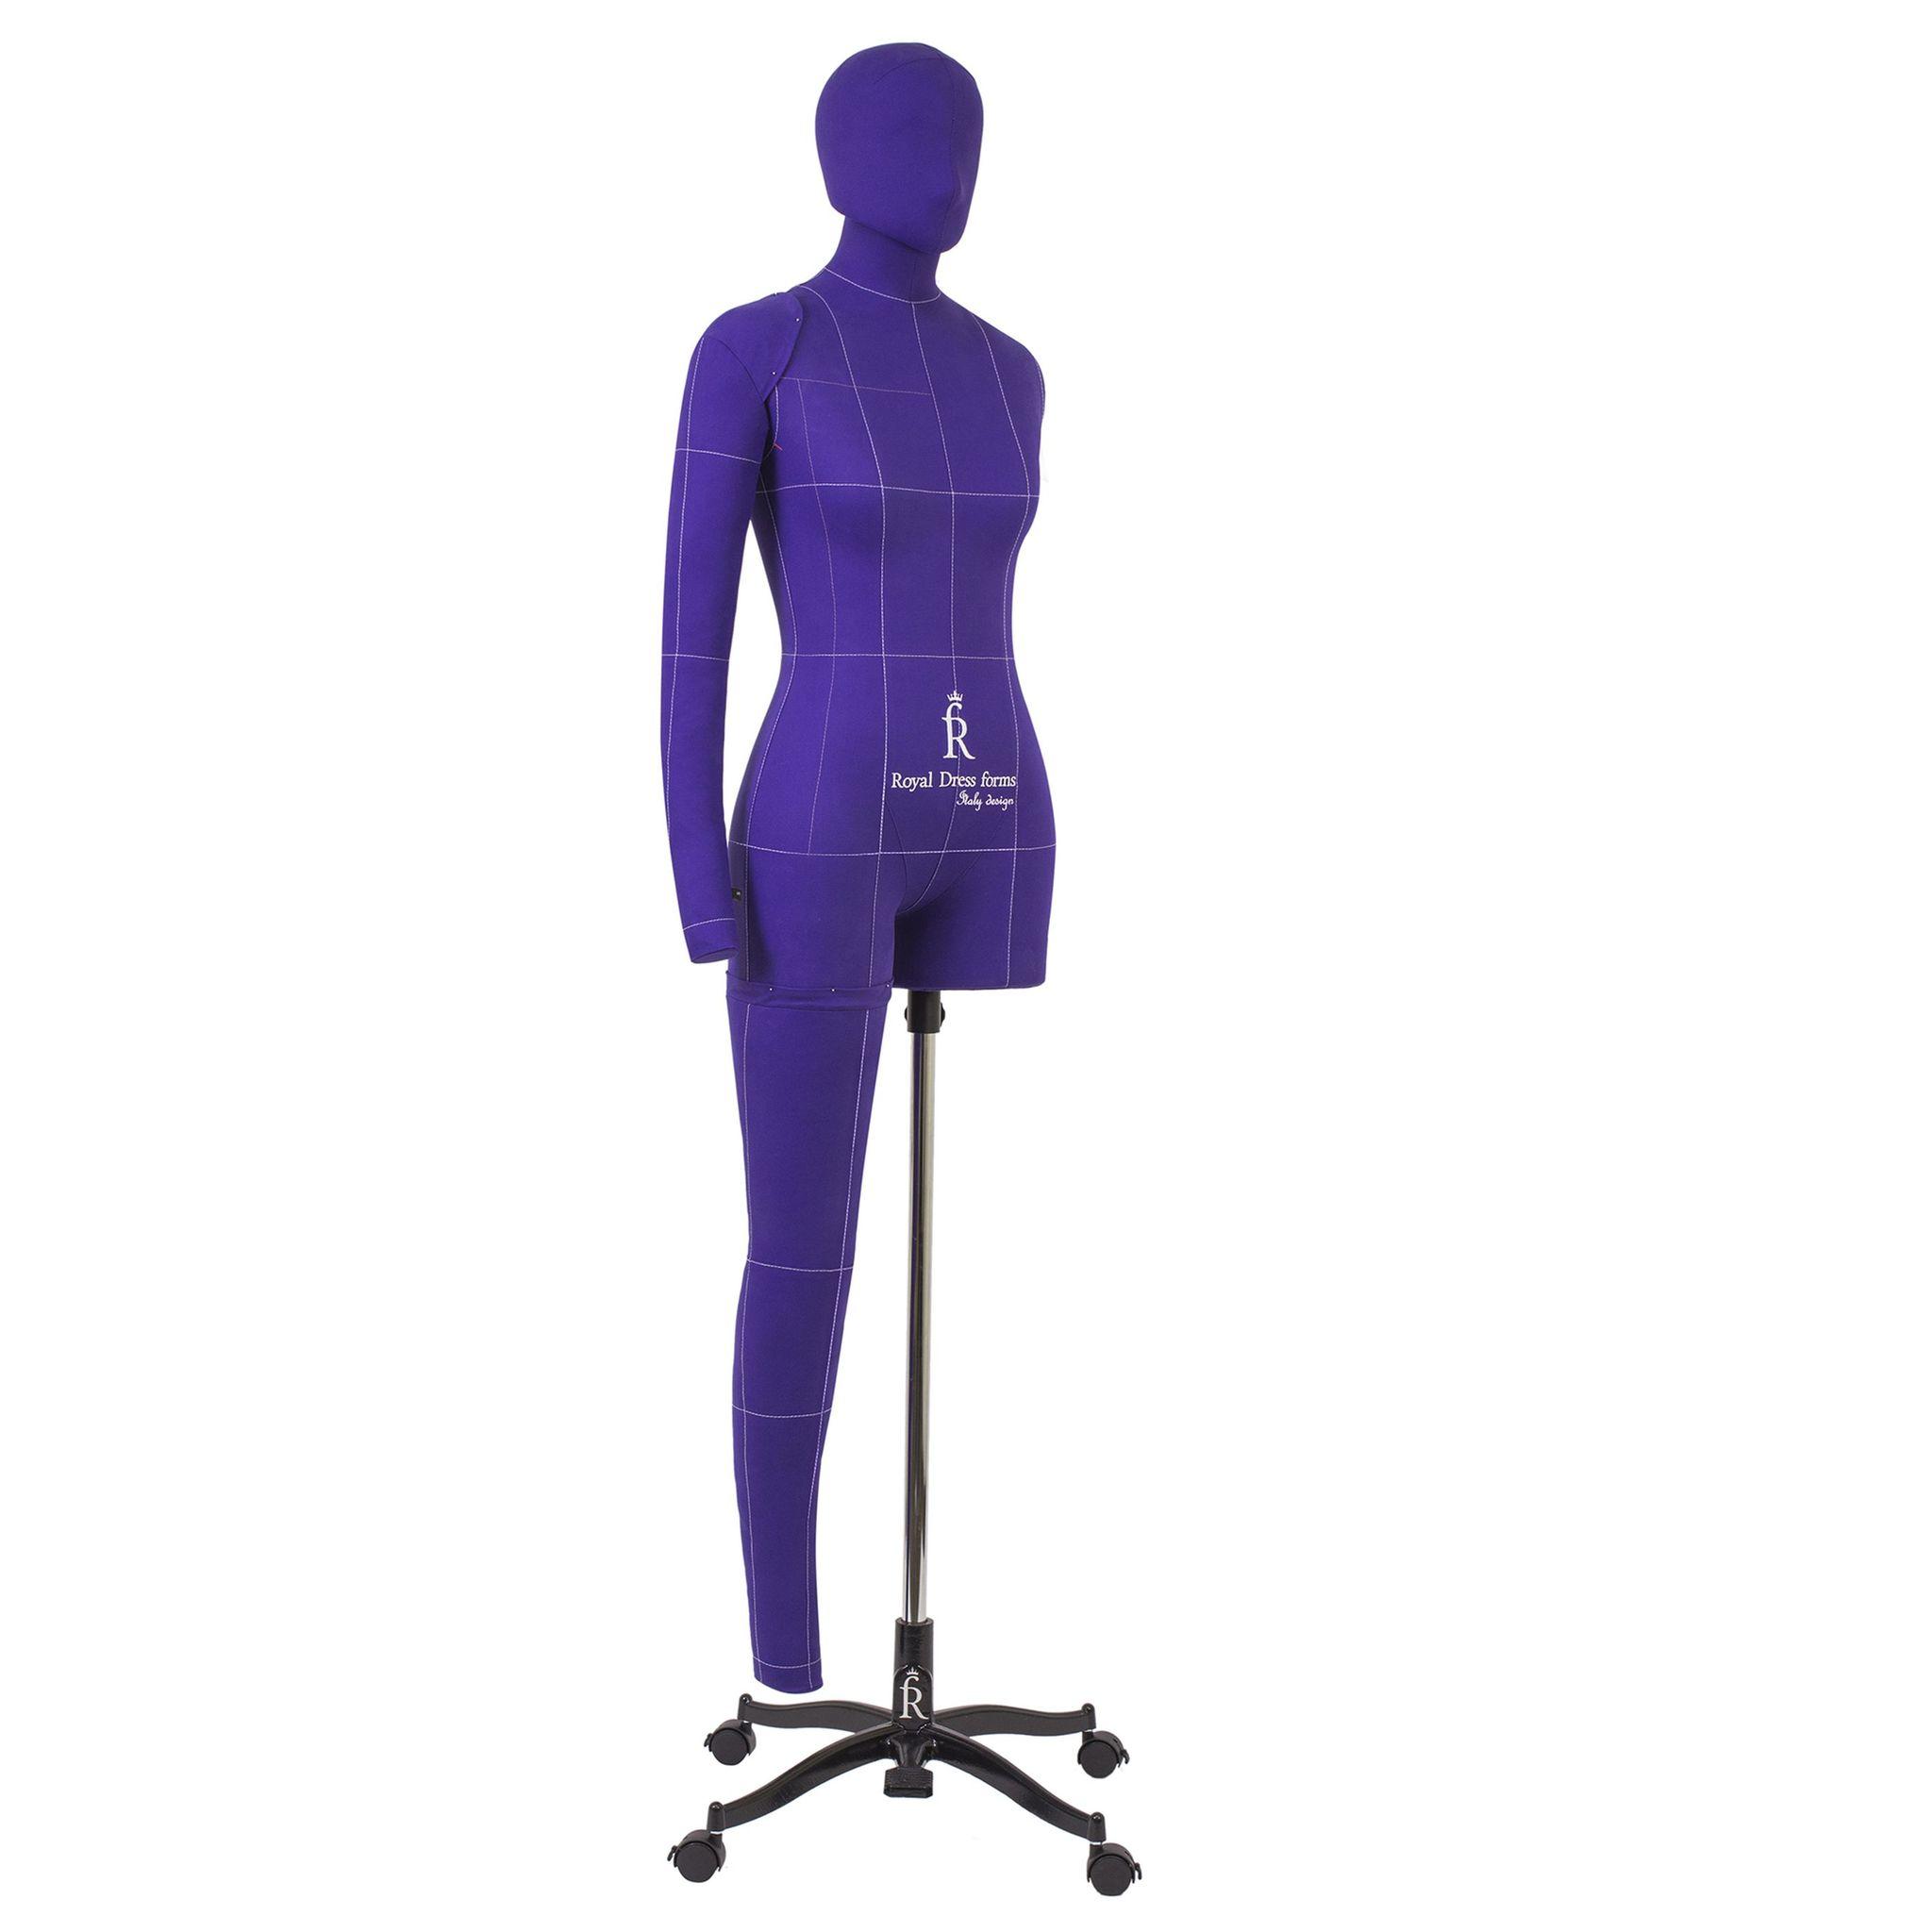 Манекен портновский Моника, комплект Арт, размер 40, ФиолетовыйФото 1